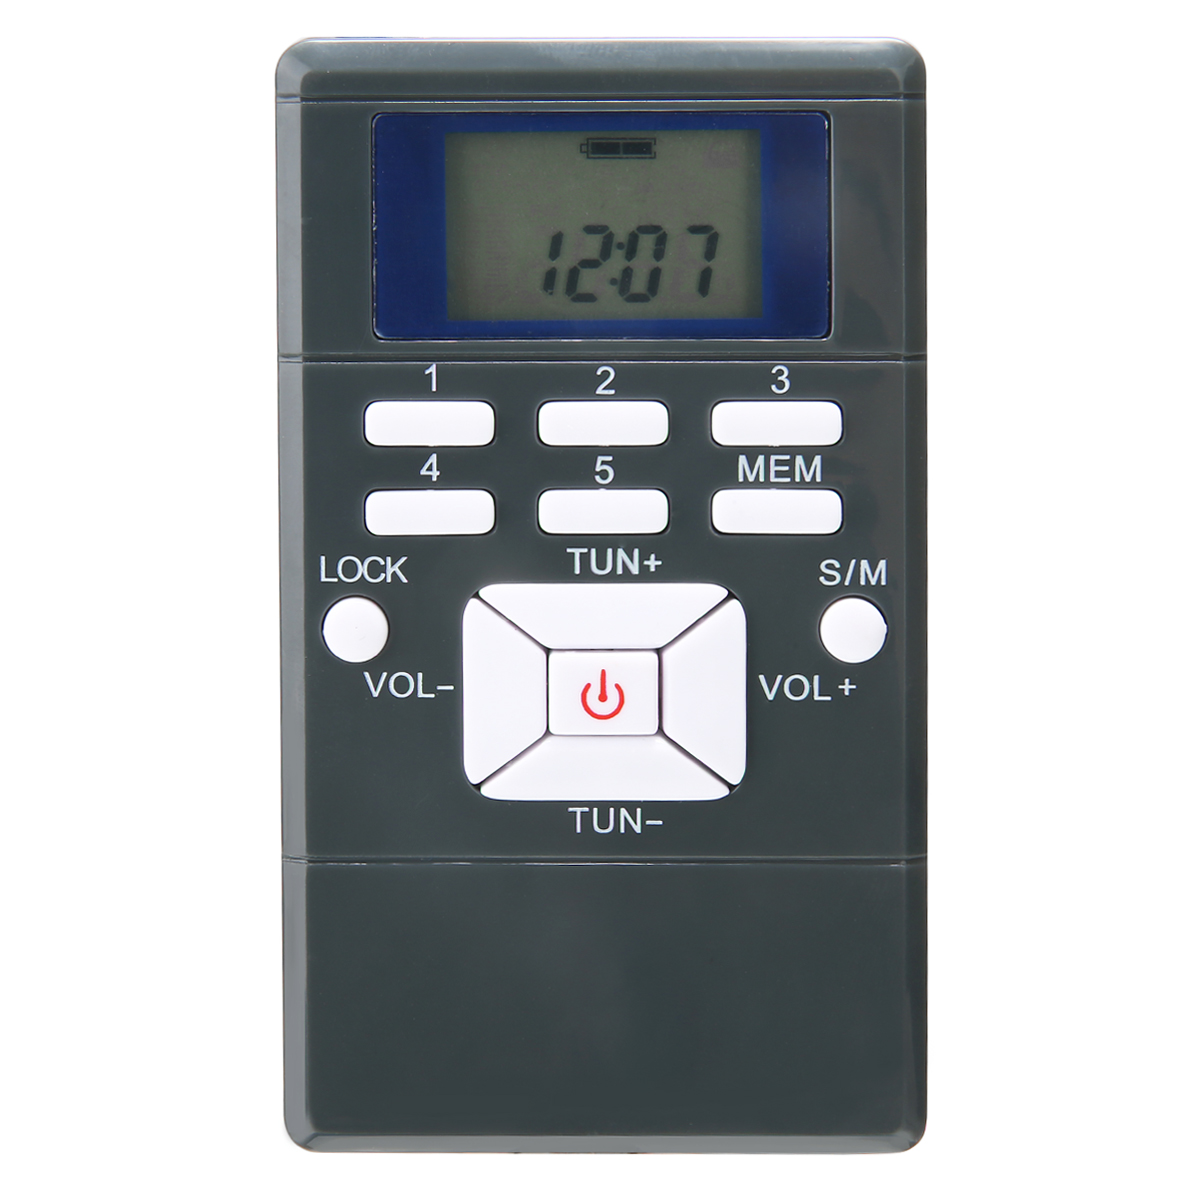 Pohiks 60-108MHz FM Radio Receiver Portable Handheld Digital FM Radio Battery Powered with Earphone Plastic Shell